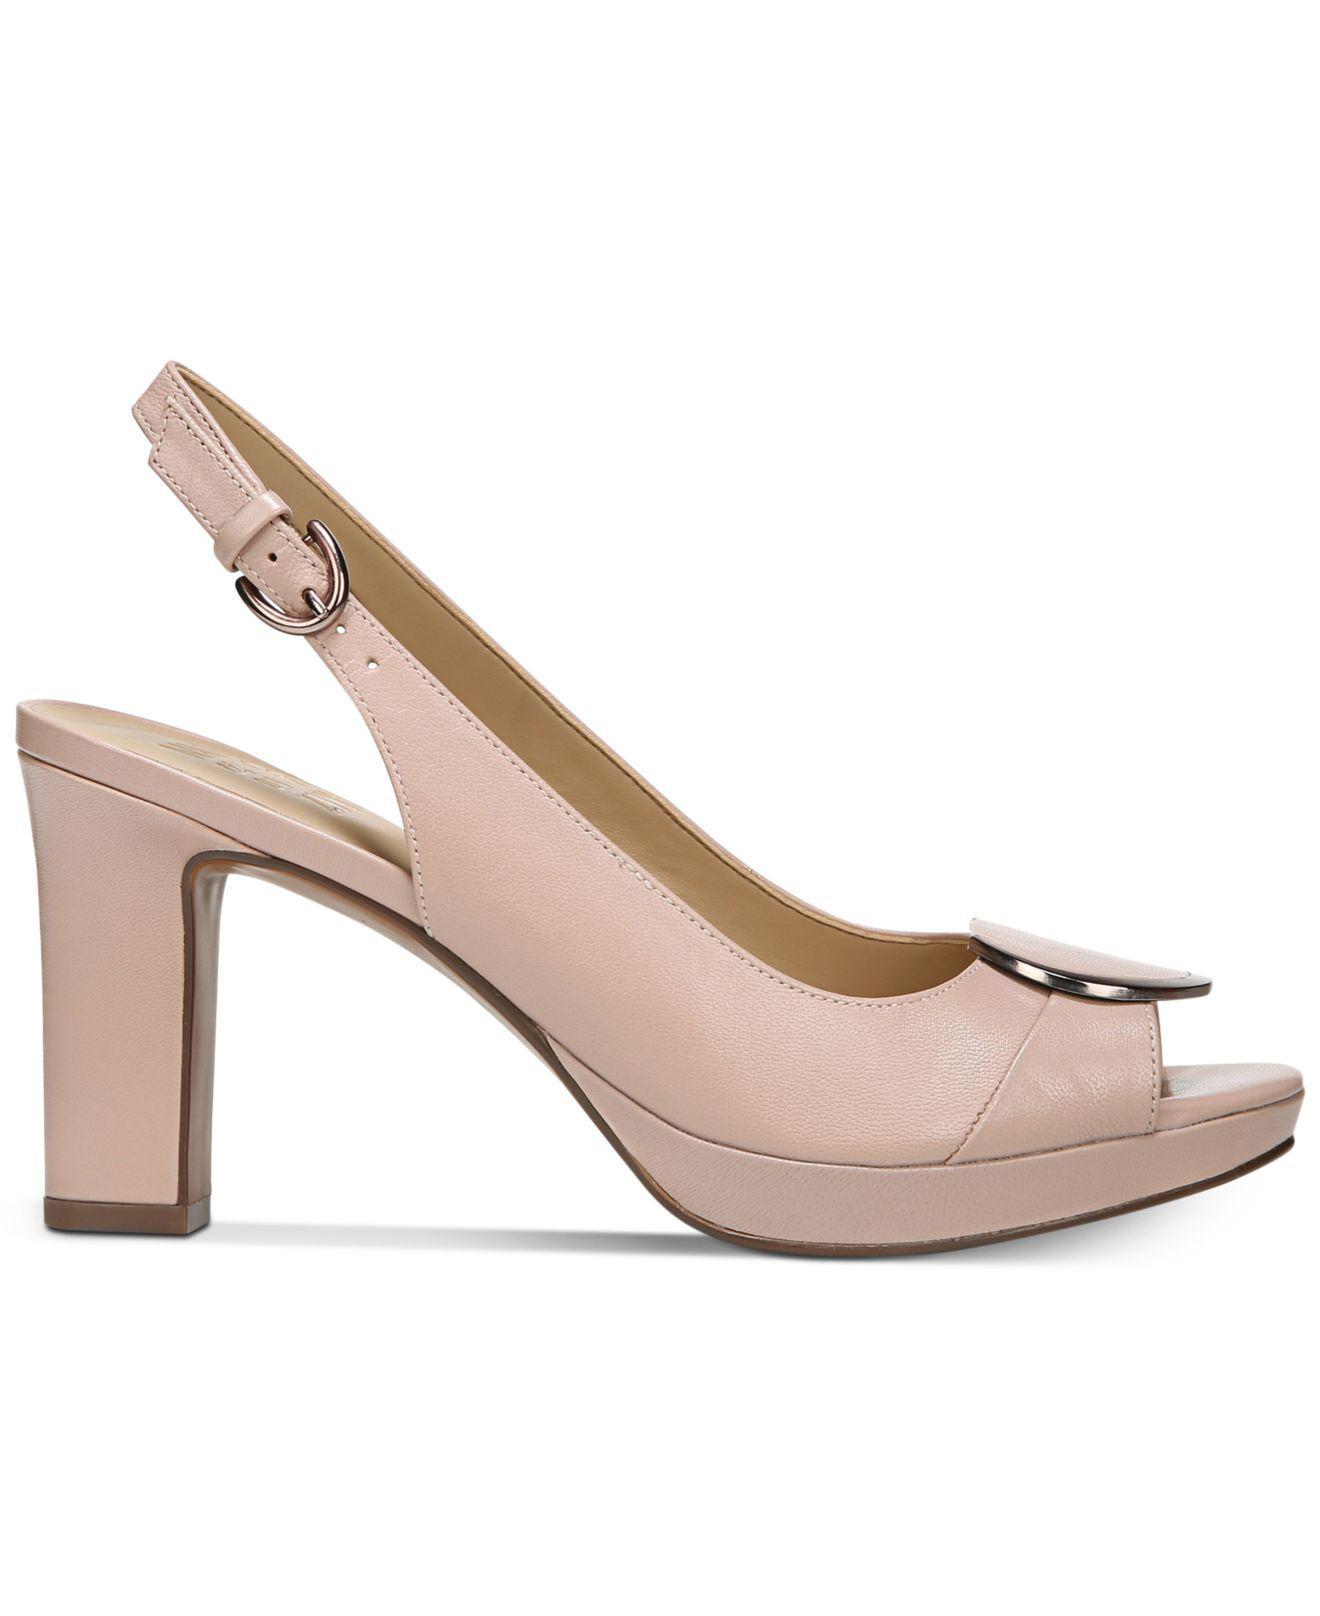 Naturalizer Ferris Peep-Toe Pumps Women's Shoes 8oQoqEw